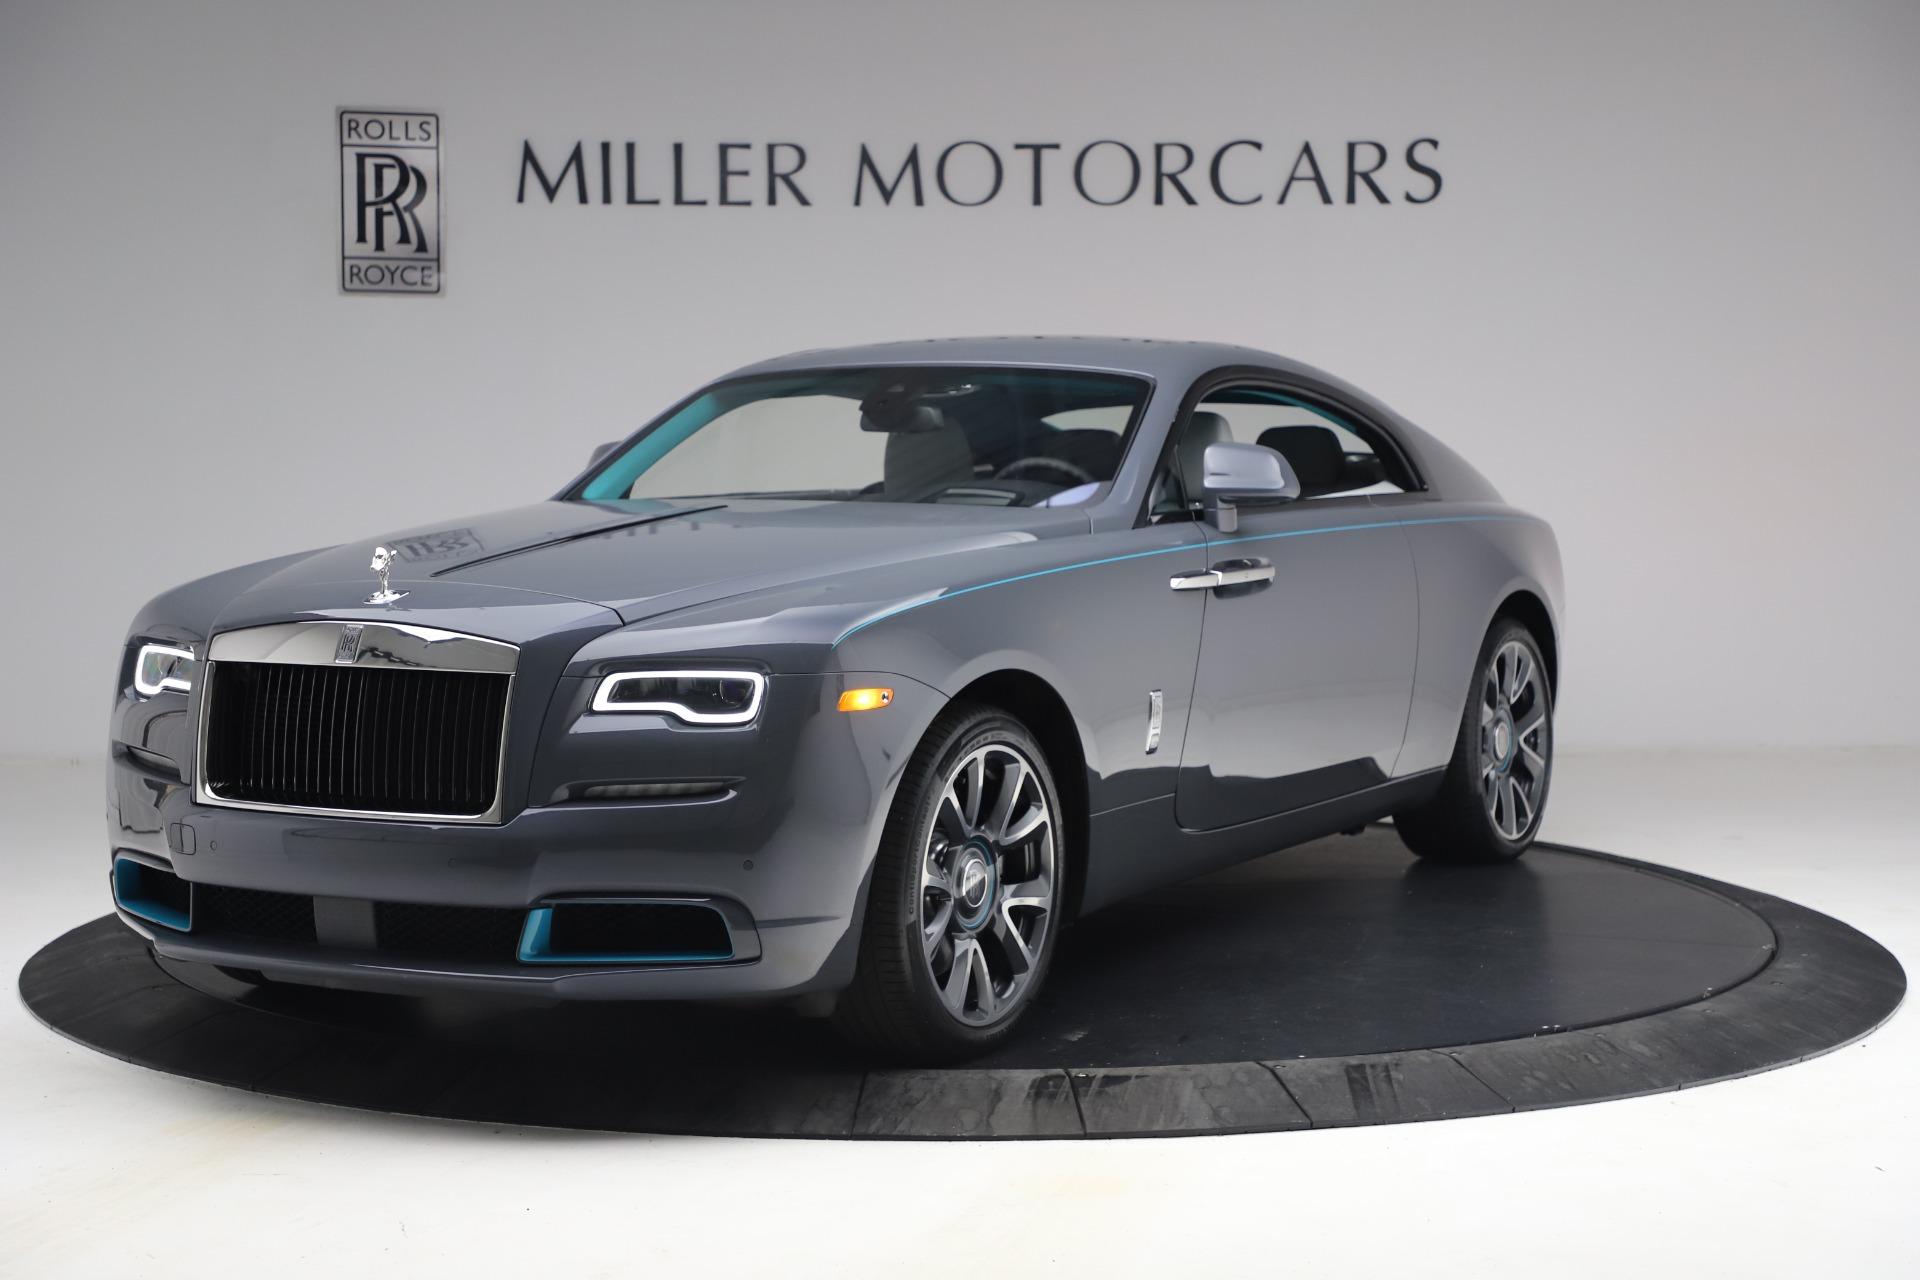 Used 2021 Rolls-Royce Wraith KRYPTOS for sale $444,275 at Rolls-Royce Motor Cars Greenwich in Greenwich CT 06830 1